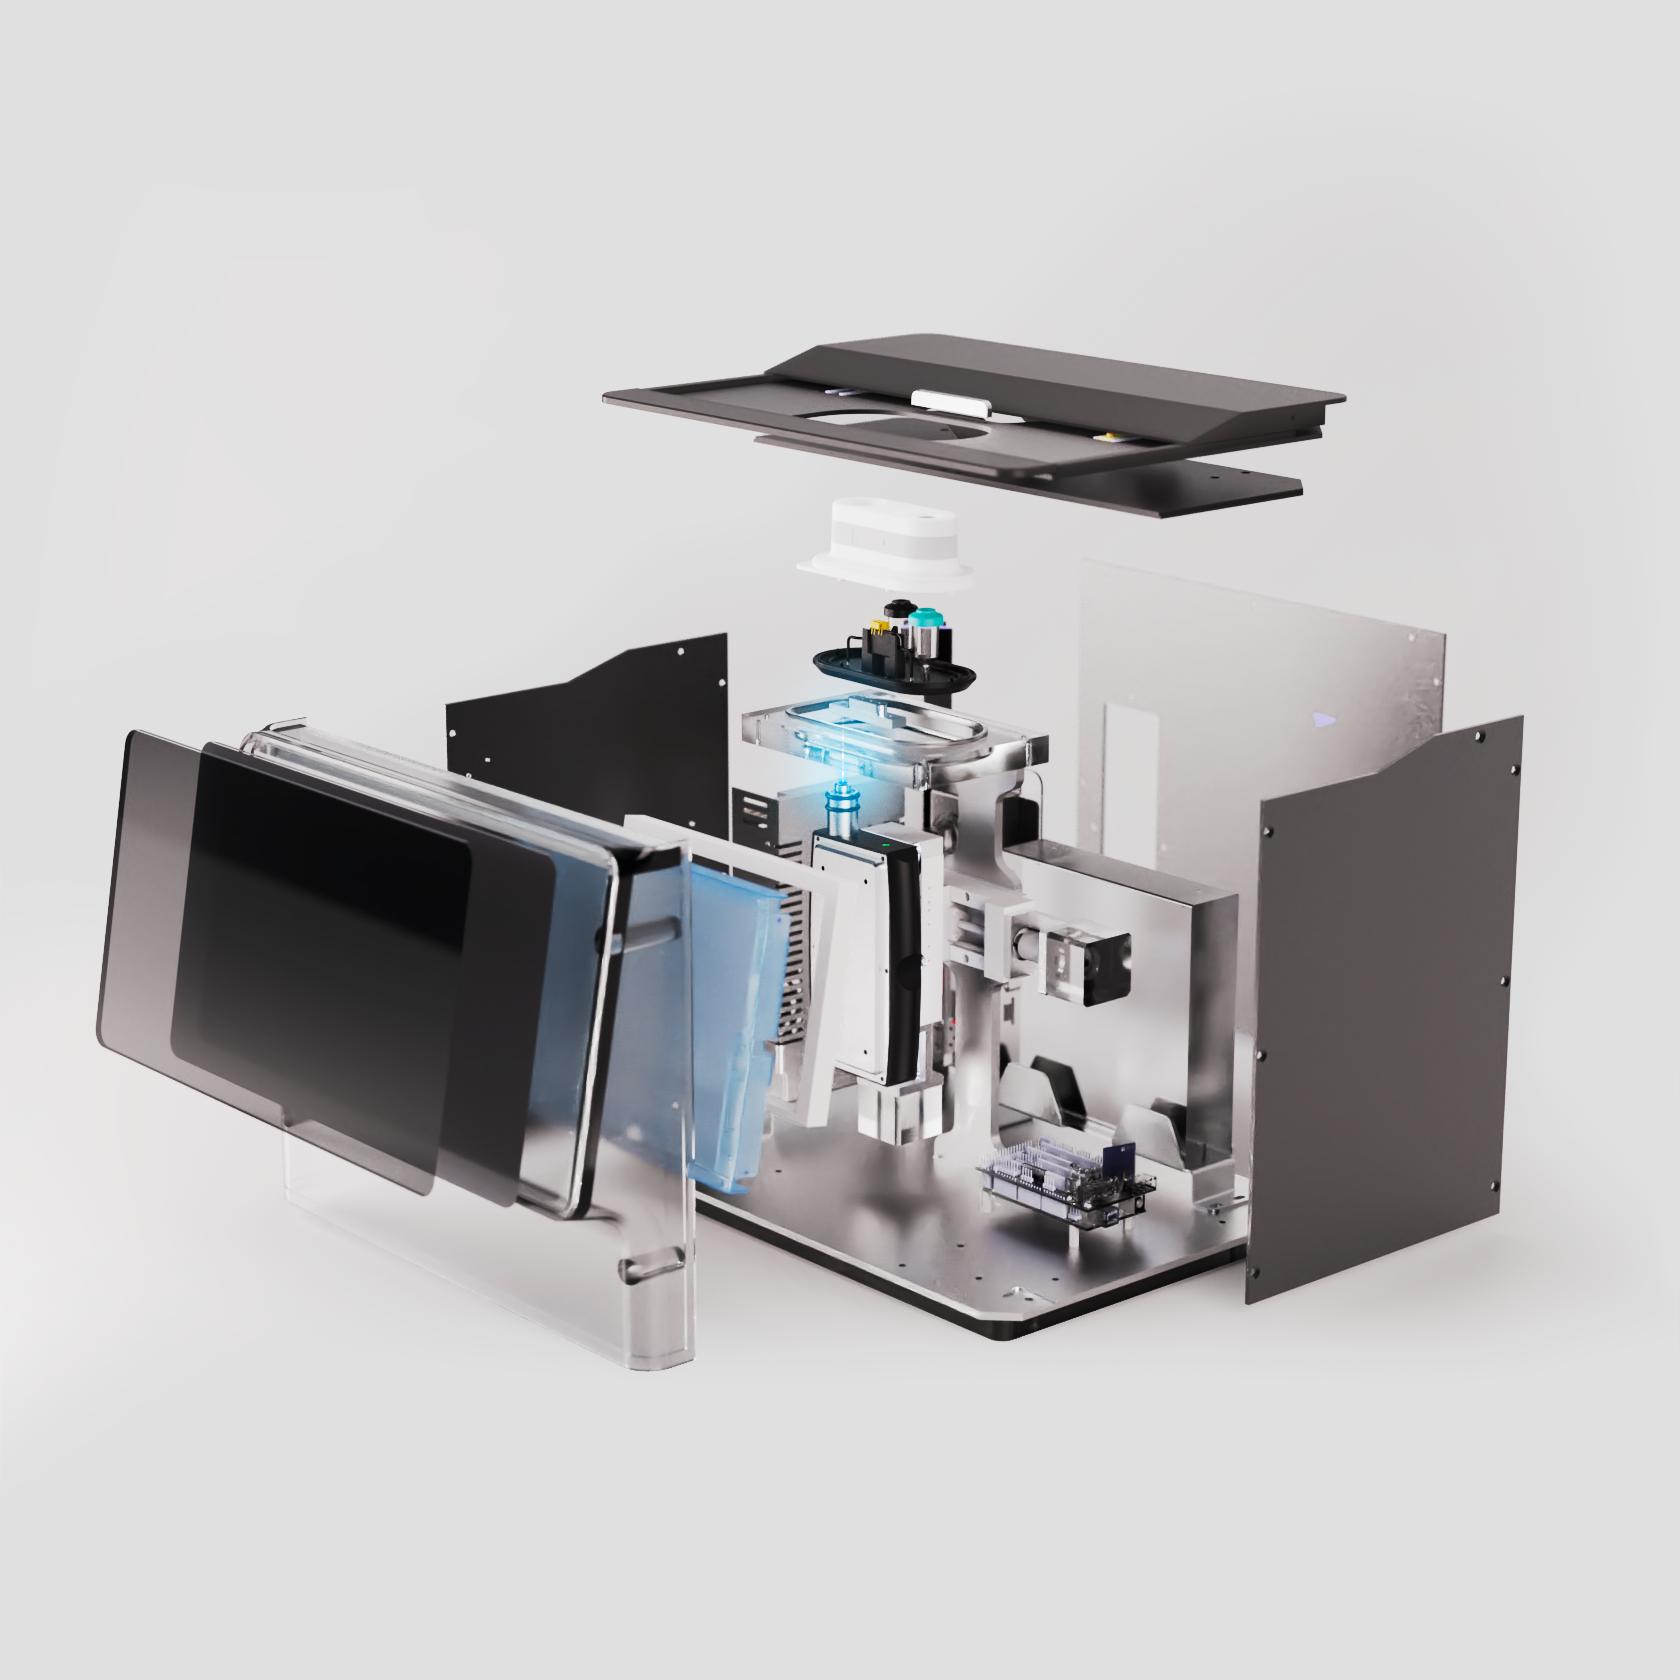 Medcom Advance - Analyseur de substances